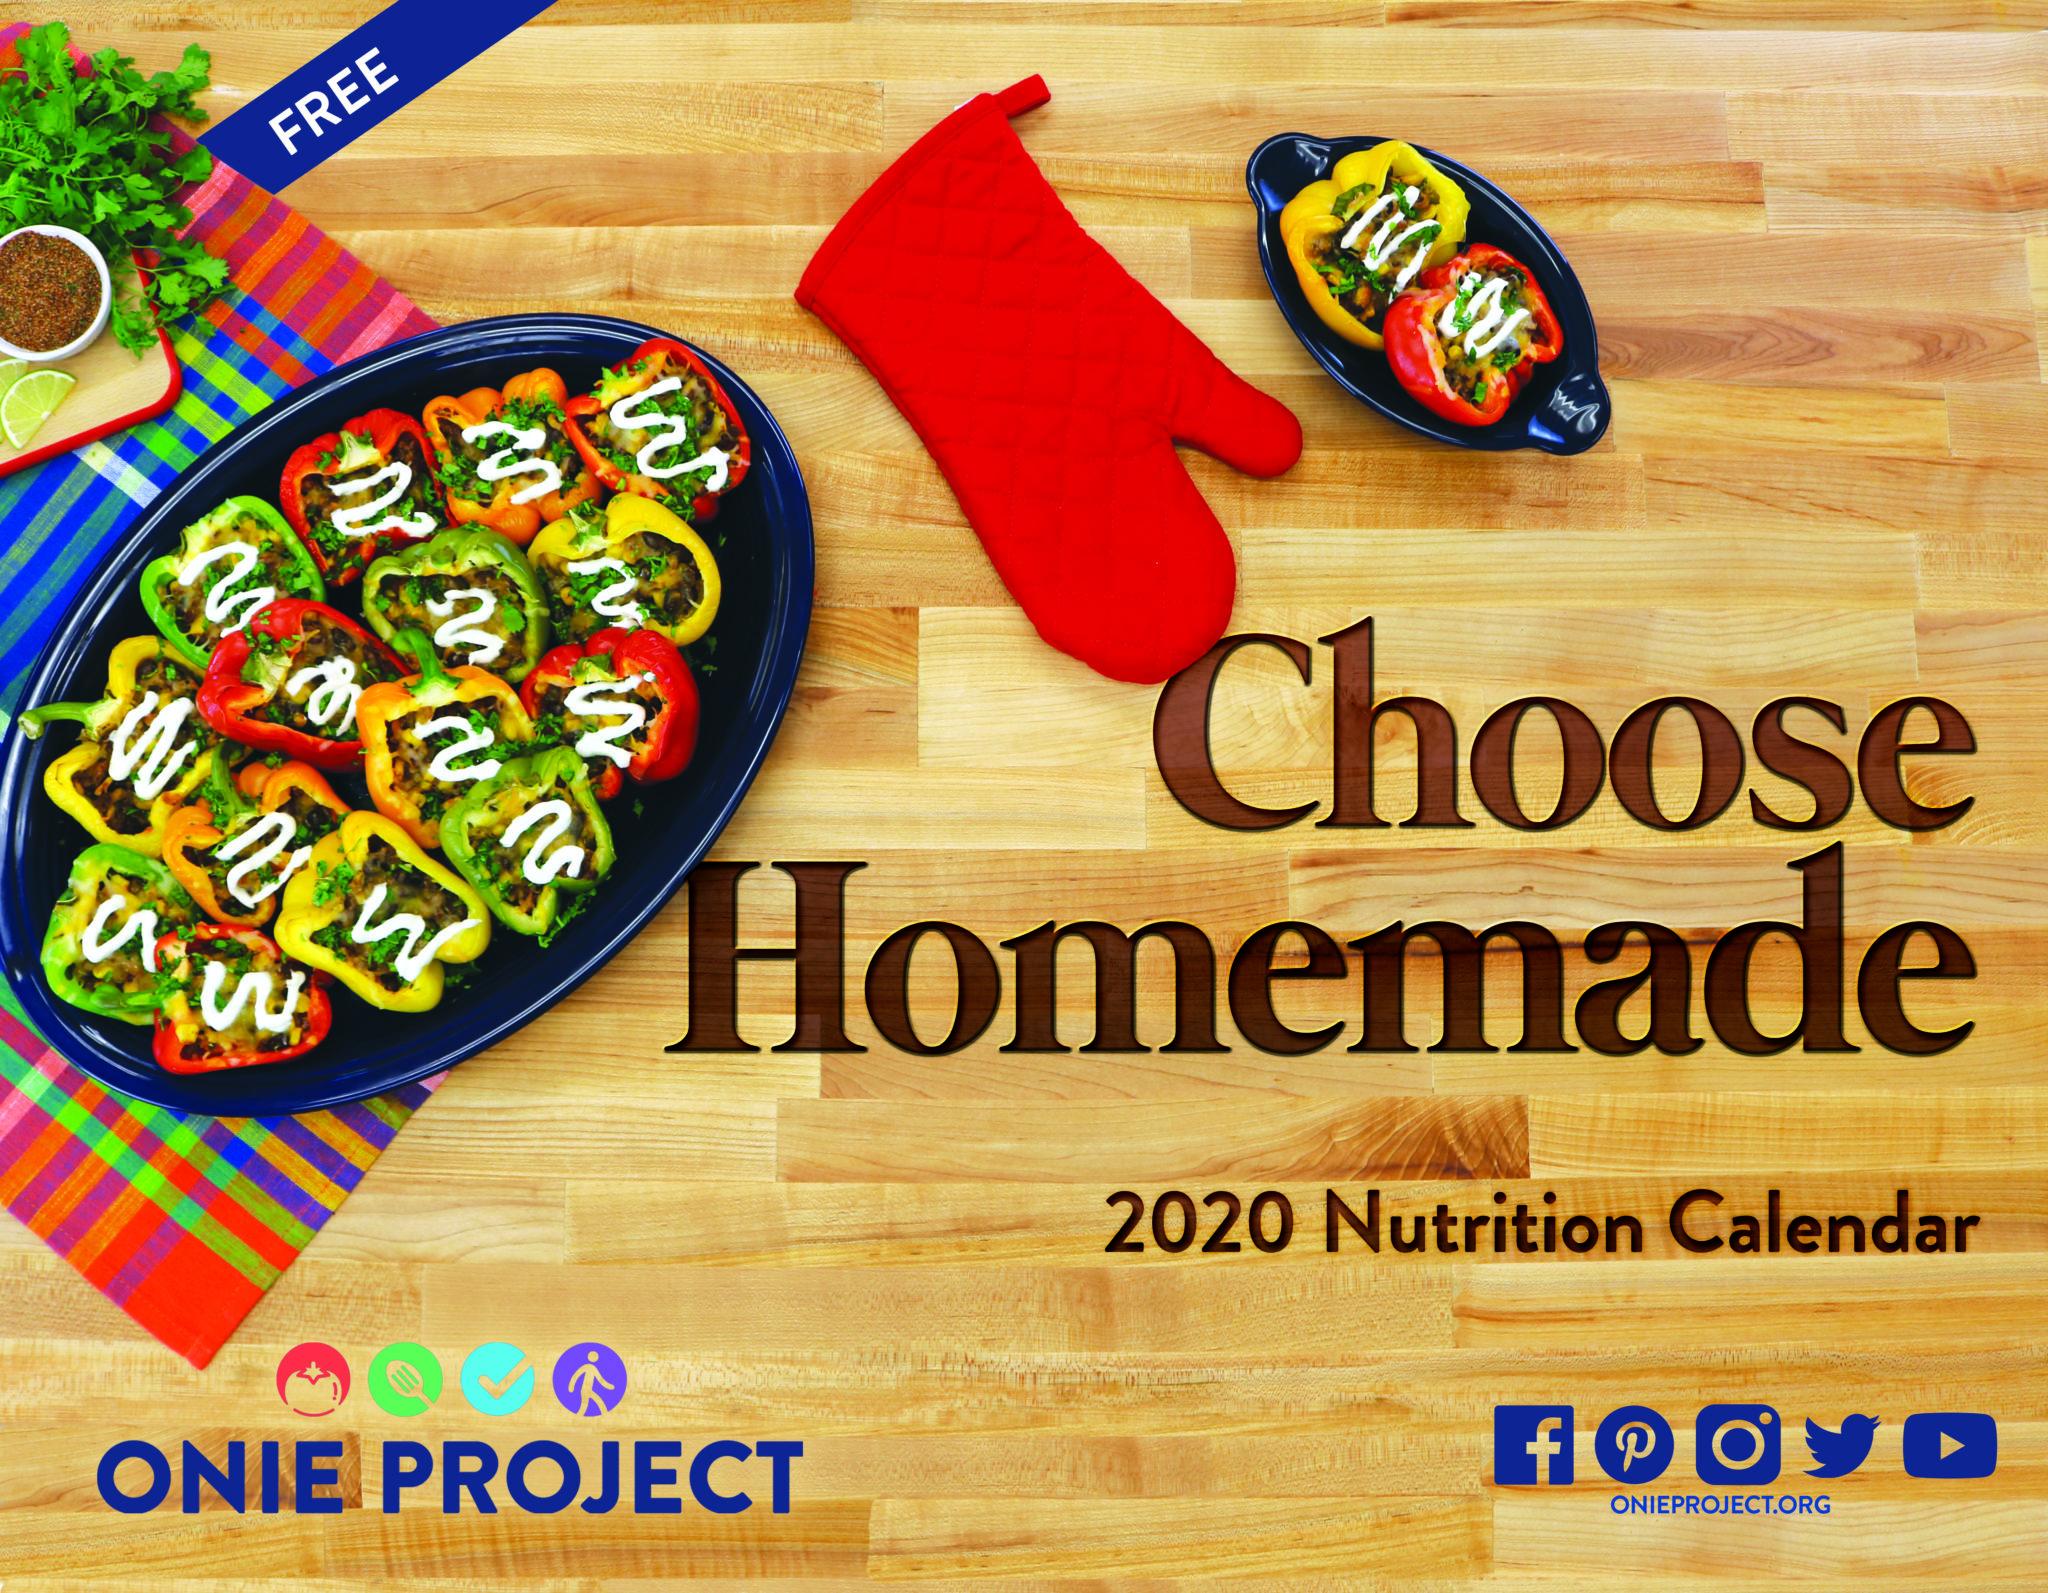 ONIE 2020 Choose Homemade Calendar